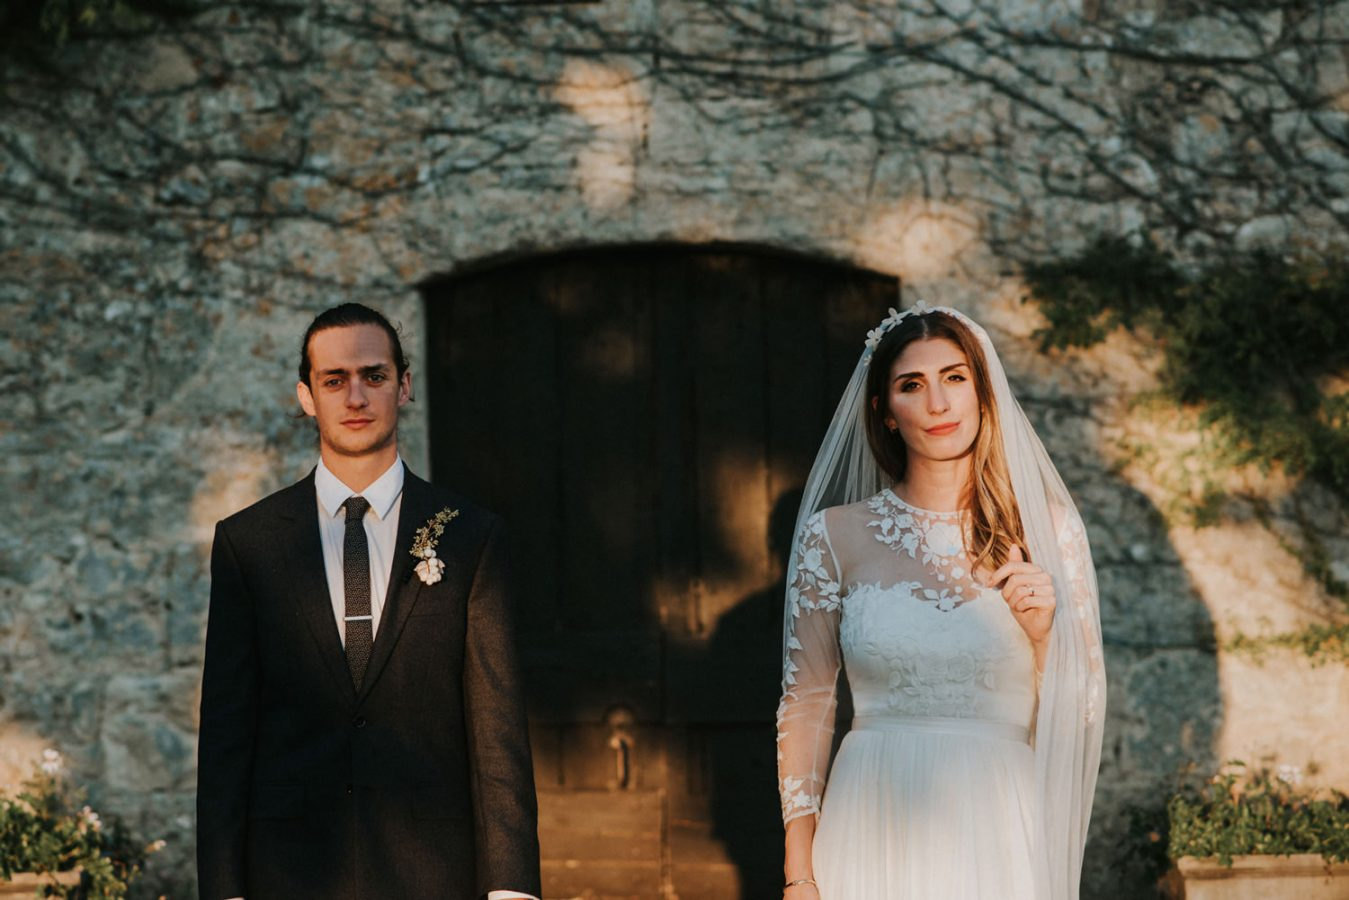 destination-french-france-wedding-fernedwards-london-wedding-photographer